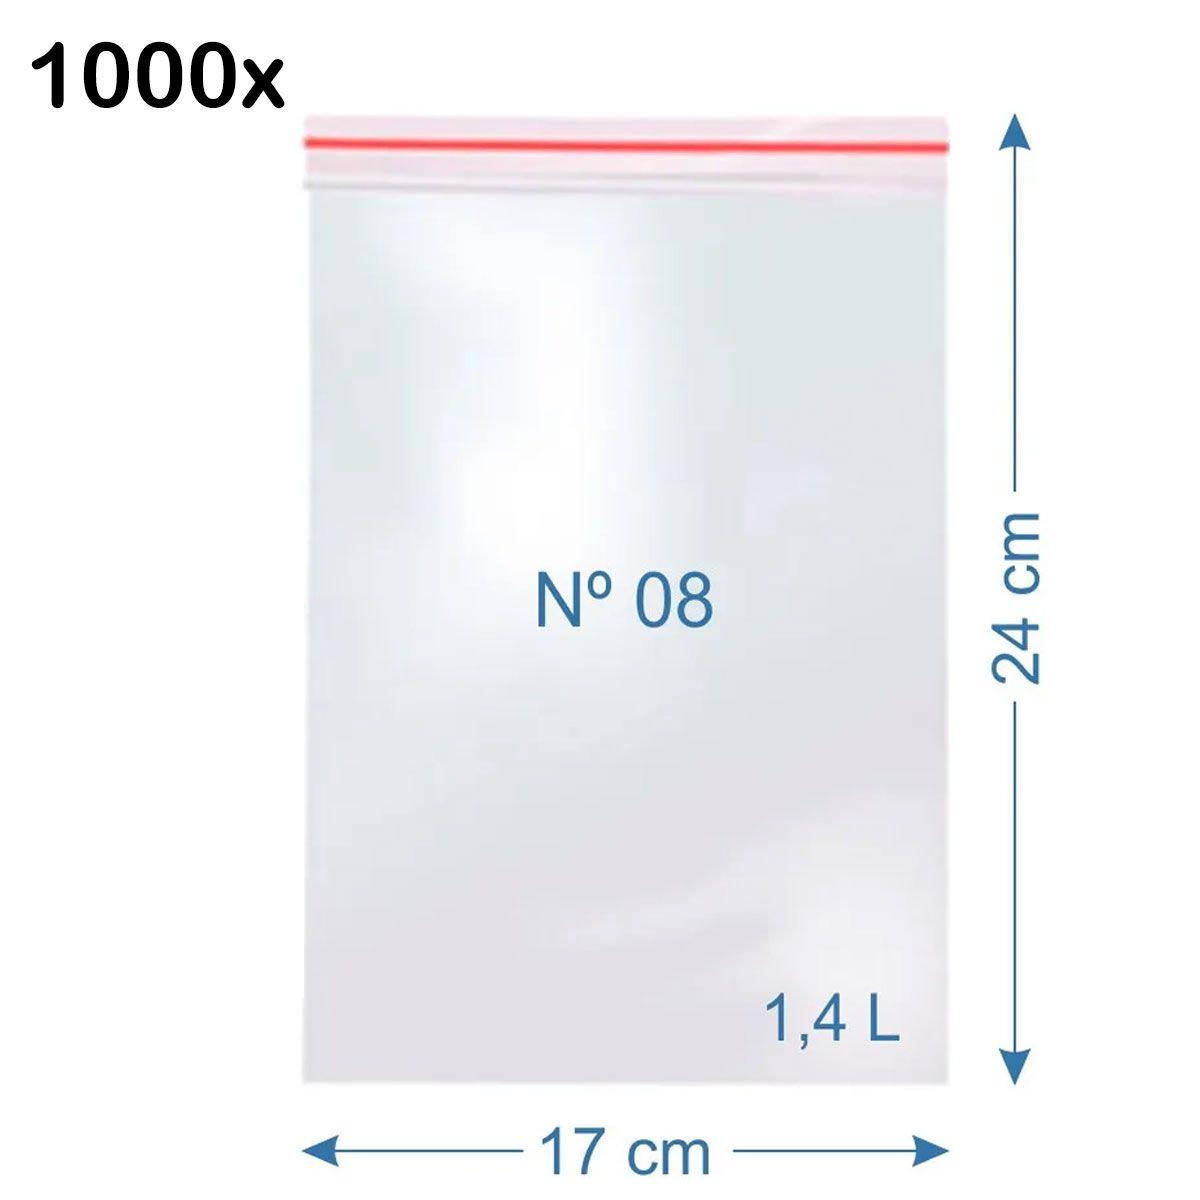 1000x Saco Plástico Zip Lock Hermético 24 x 17 cm Nº 8